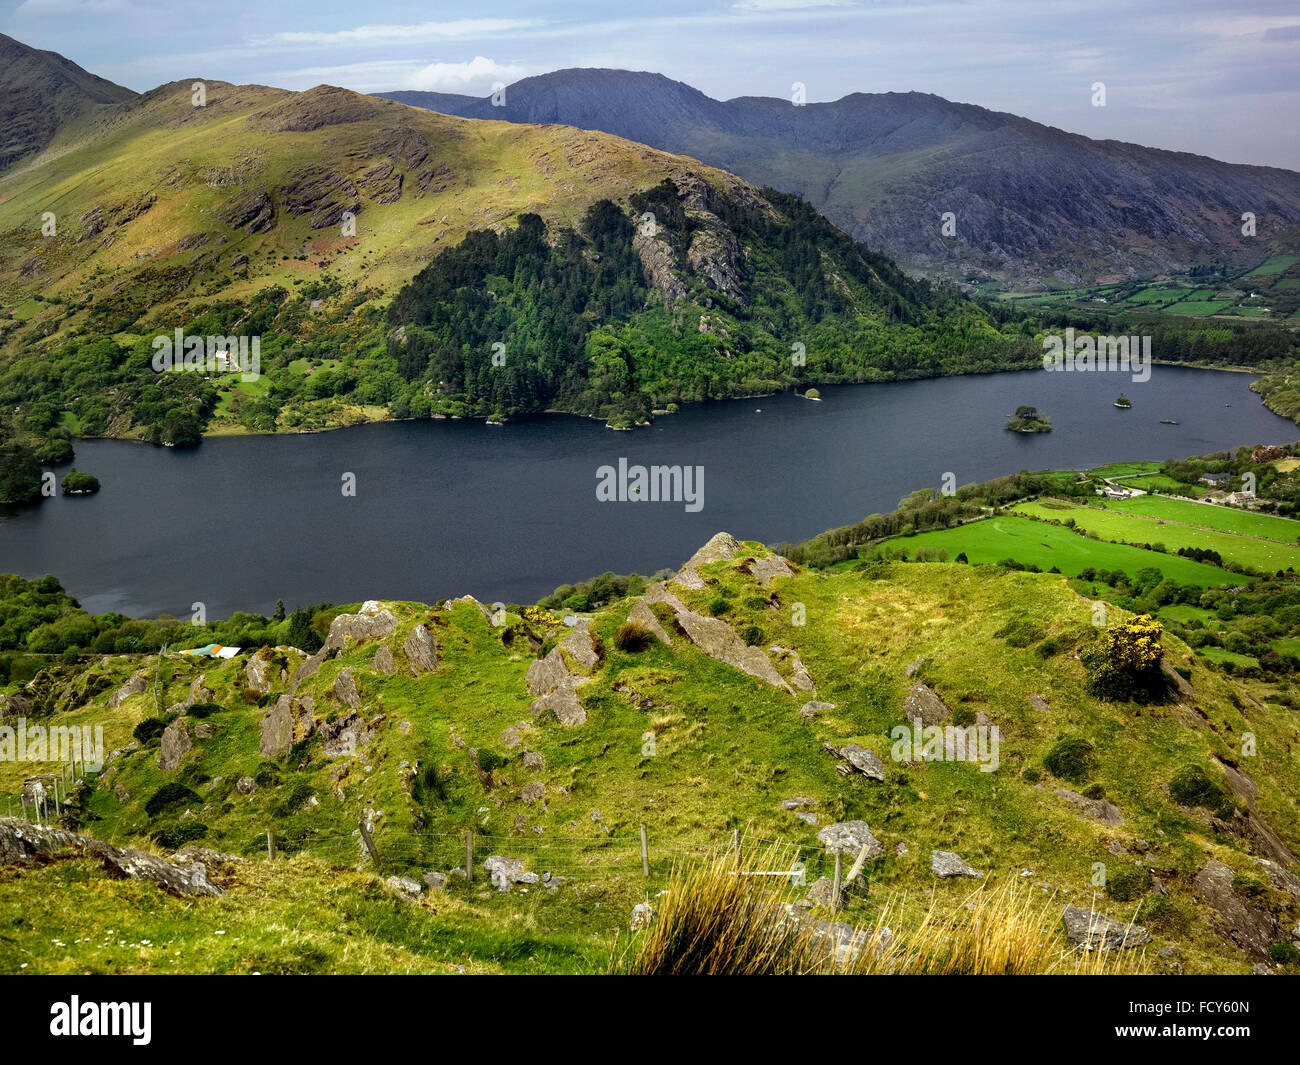 Glanmore Lake, Healy Pass, Beara Peninsula, Kerry - Stock Image